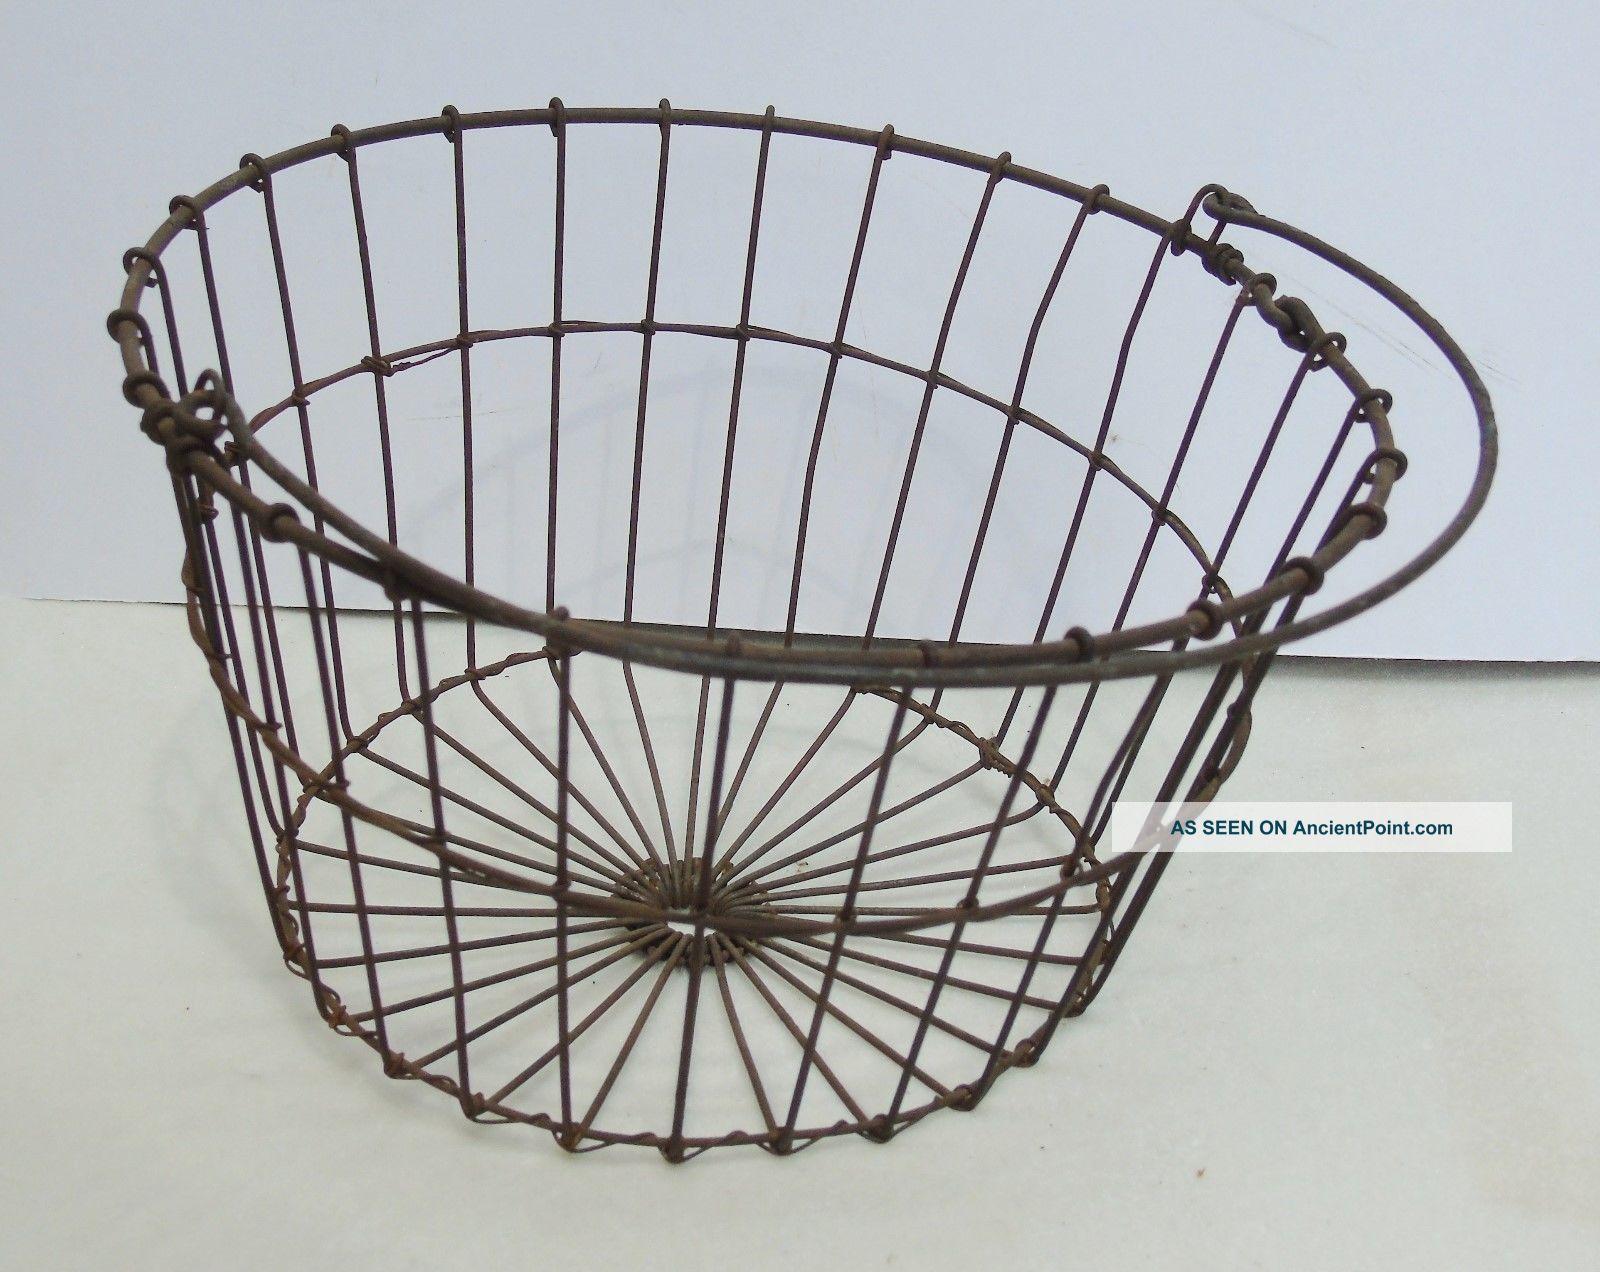 Antique Primitive Metal Wire Egg Basket W/ Handle Chickens Farm